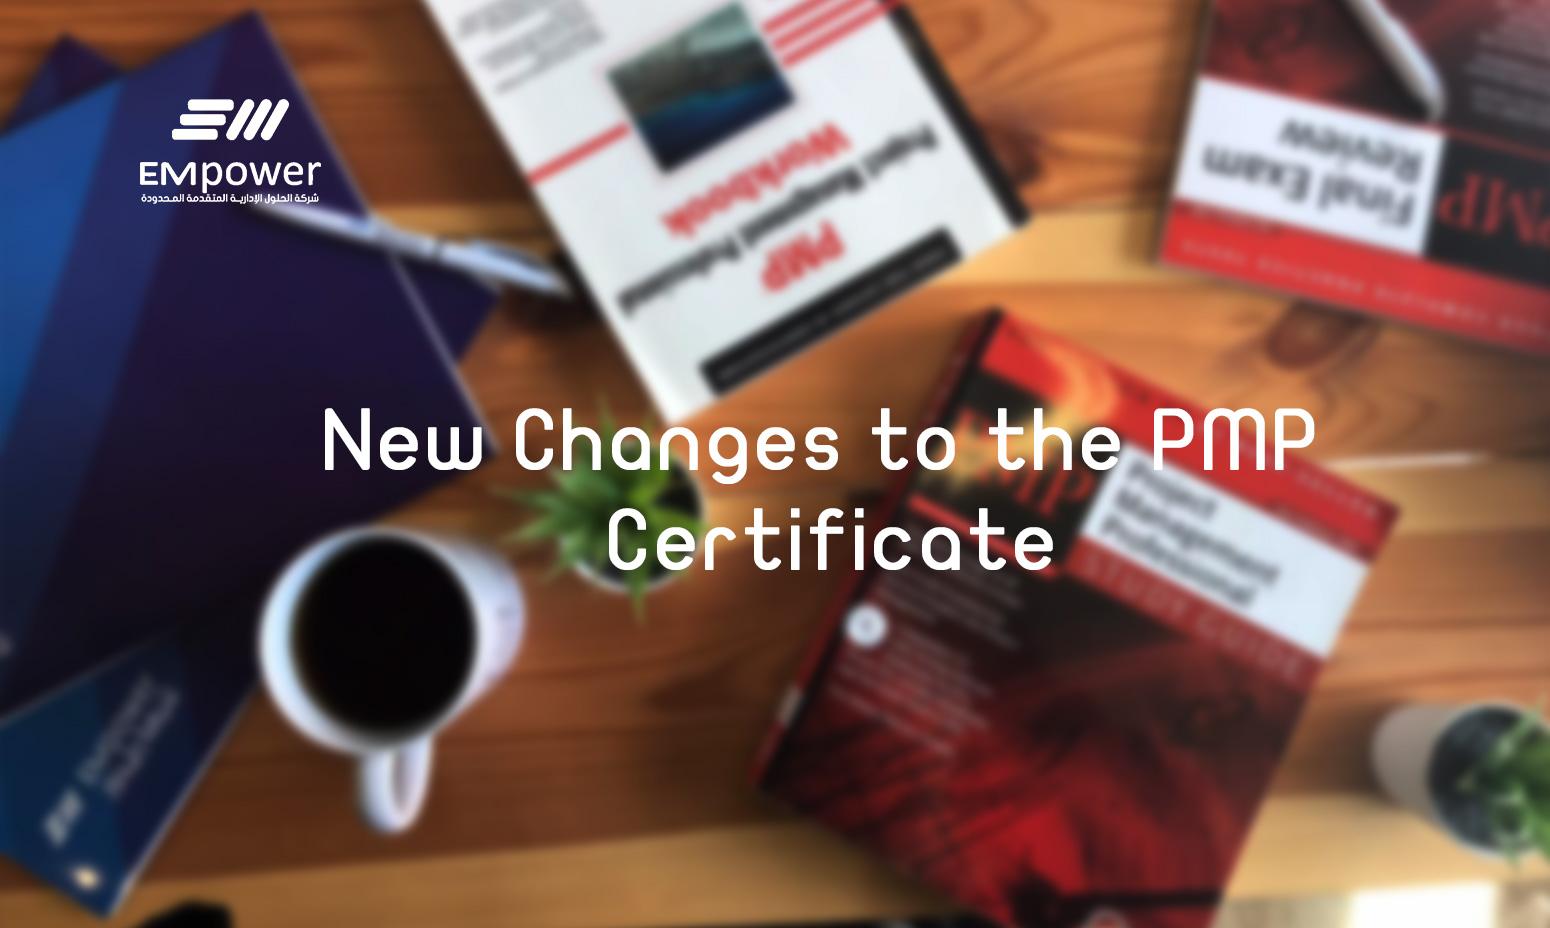 New Changes to the PMP Certificate - التغييرات الجديدة على شهادة PMP